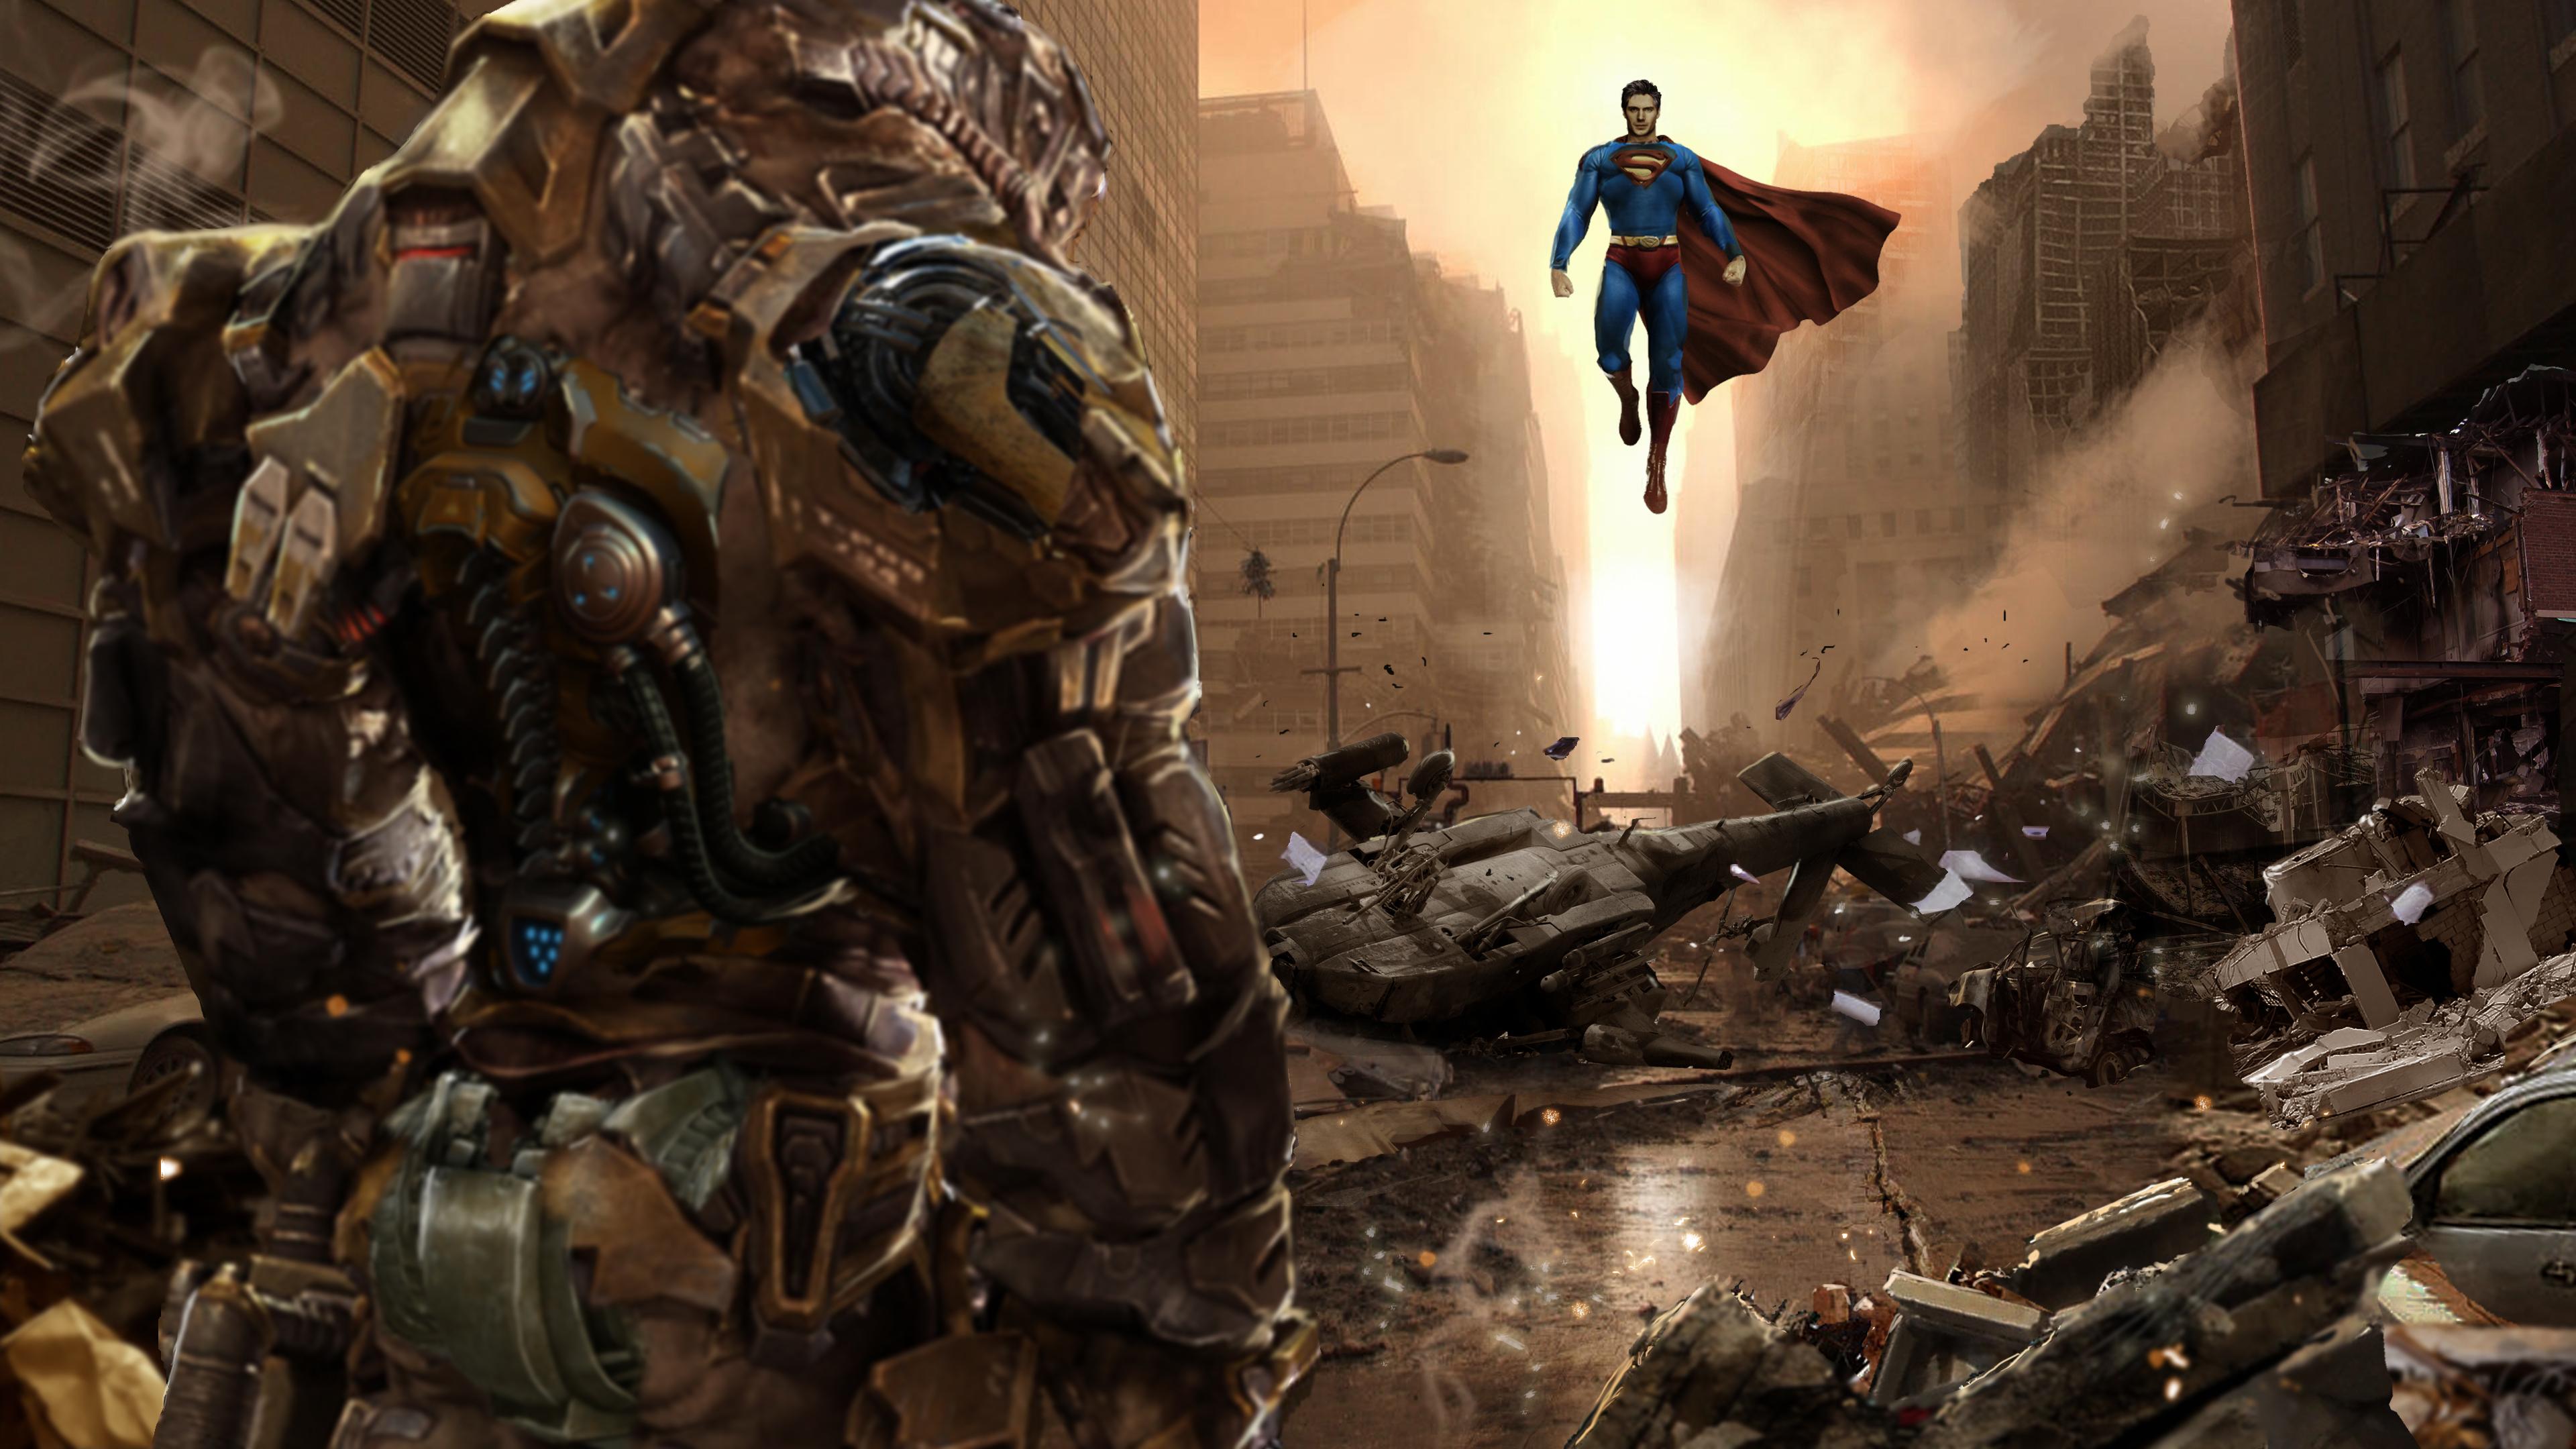 superman vs darkseid 1565053430 - Superman Vs Darkseid - superman wallpapers, superheroes wallpapers, hd-wallpapers, digital art wallpapers, deviantart wallpapers, artwork wallpapers, 4k-wallpapers